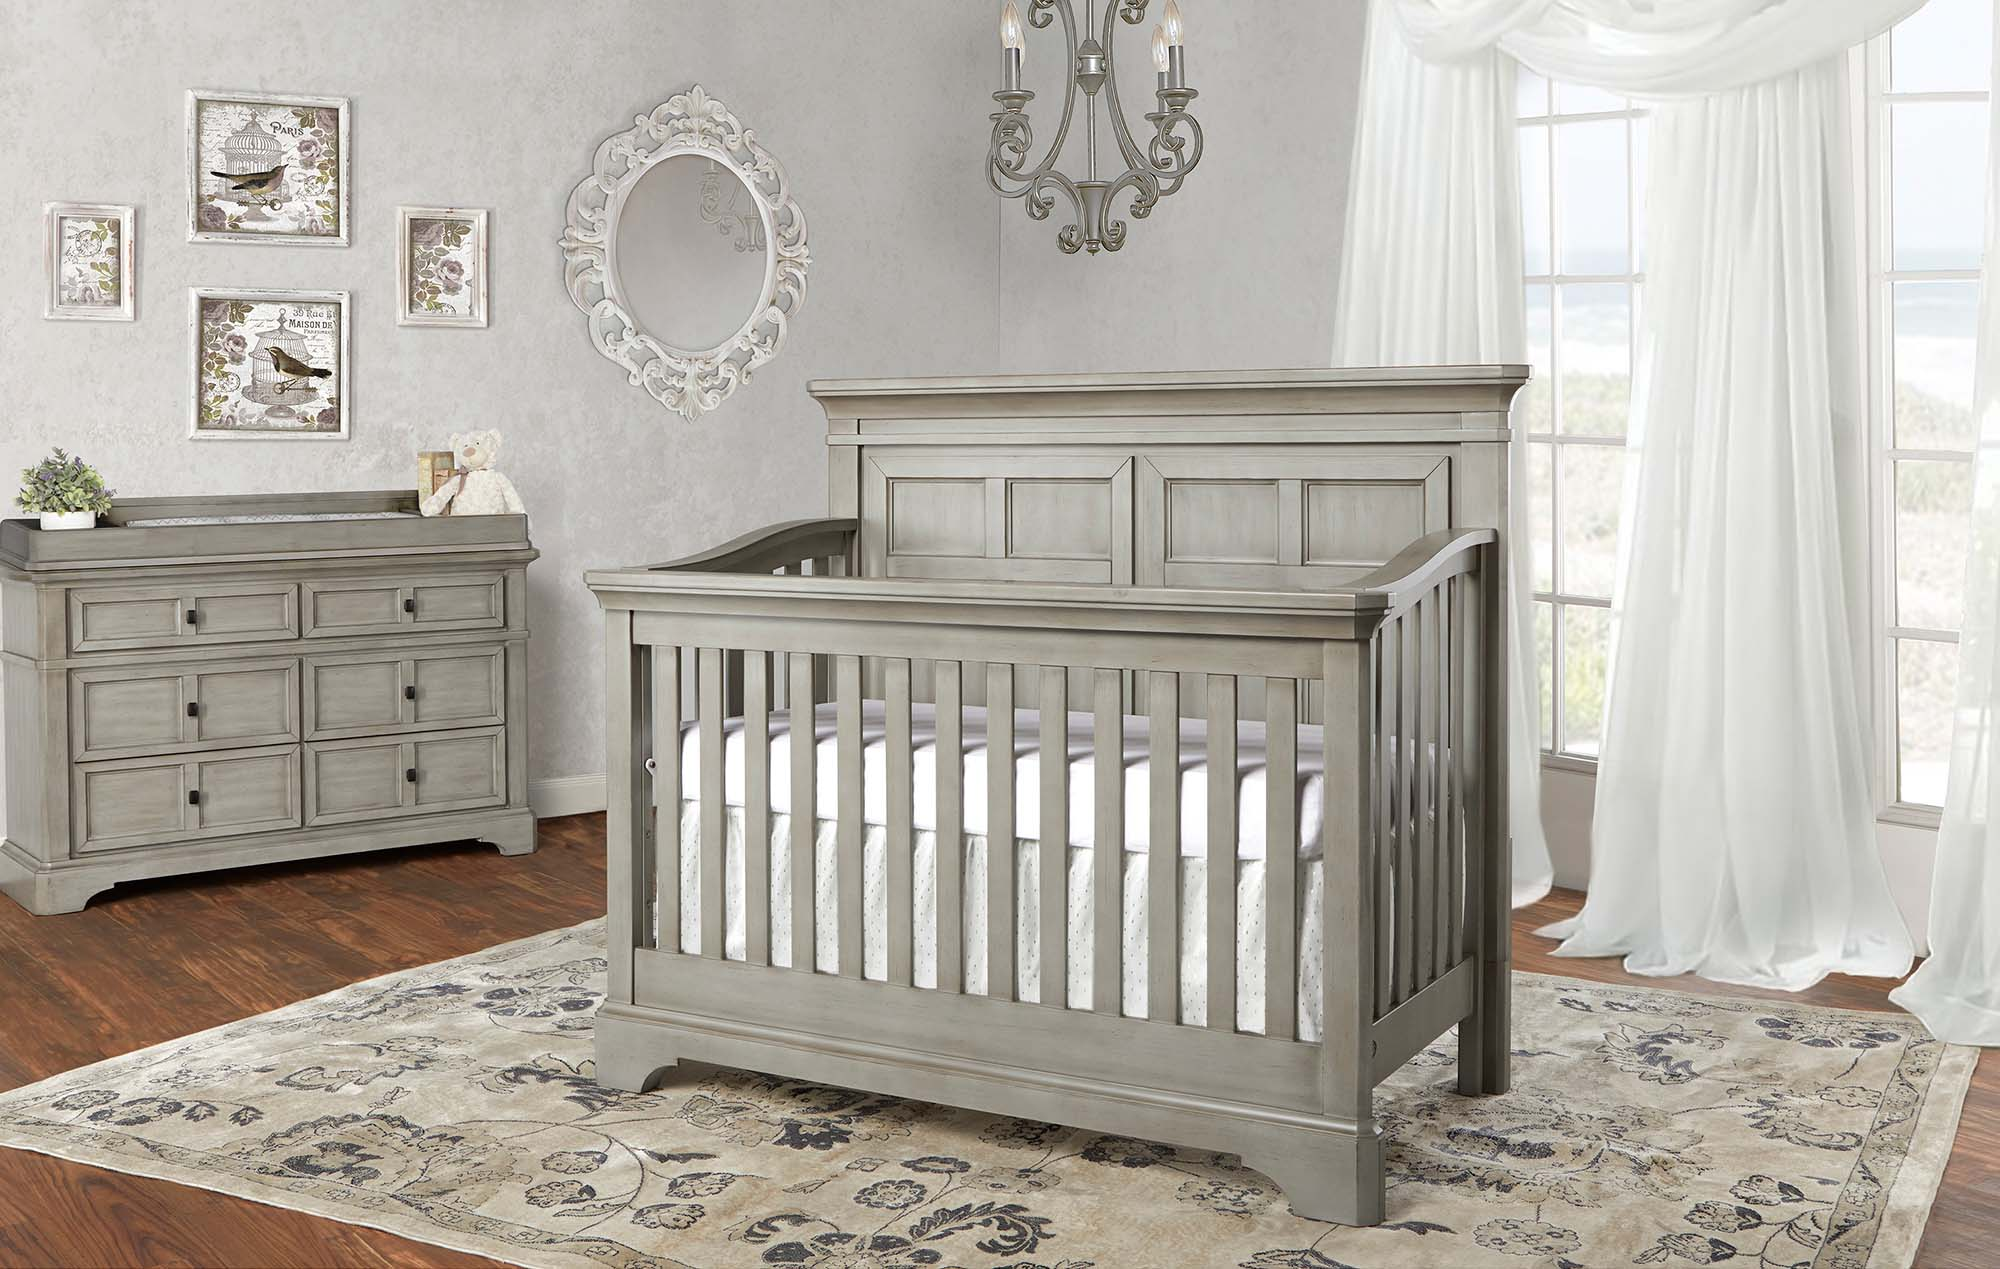 PROVENCE Crib in Ash Grey